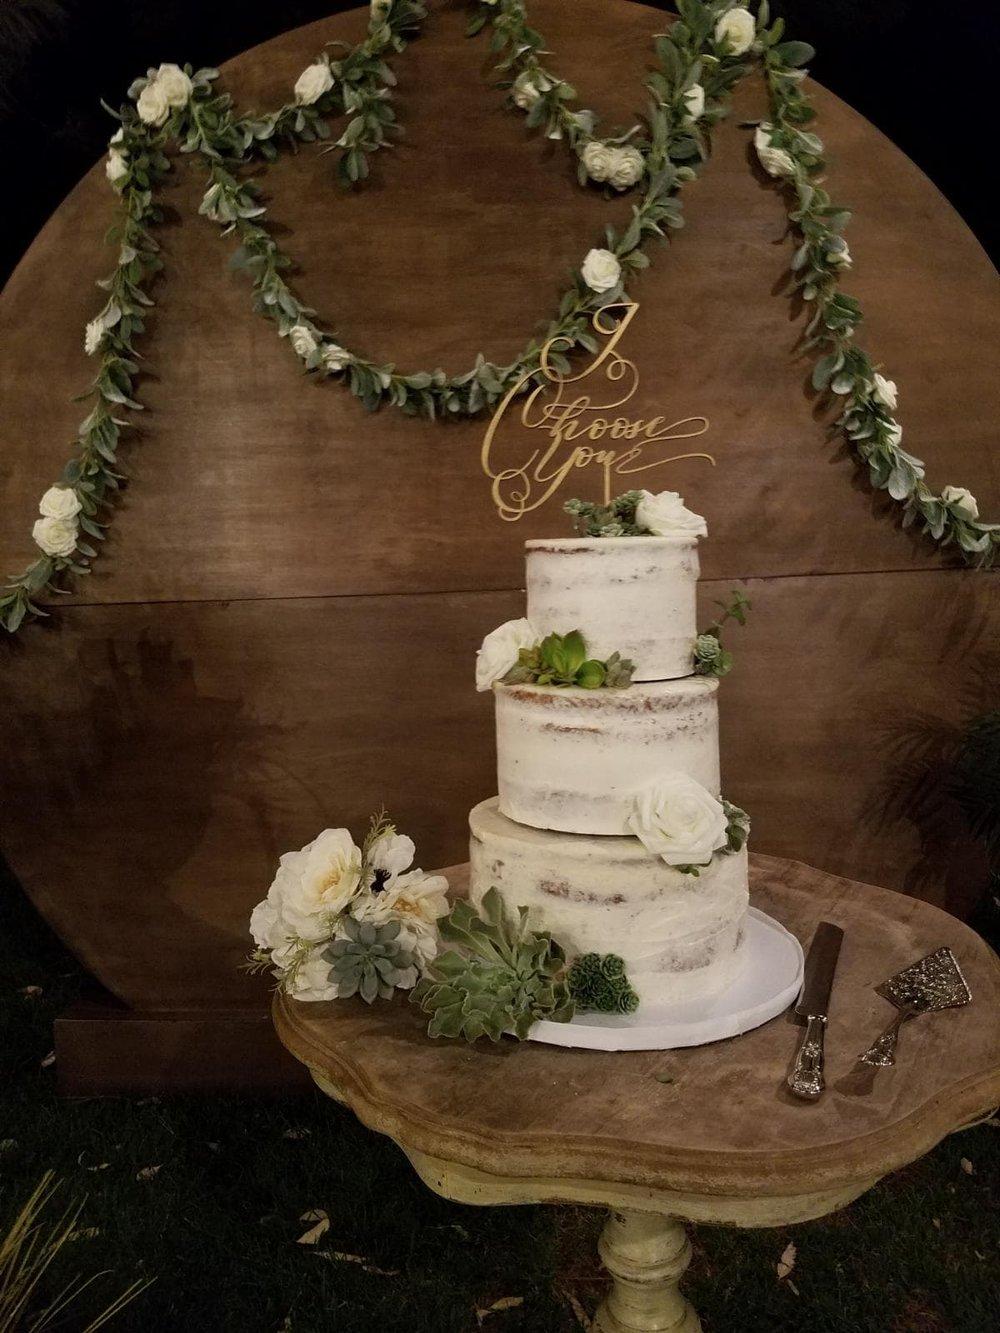 Cake:  Little Wonder Cakes    Cake Styling & Set-up:  Eyesome Events    Circle Backdrop:  Ten Four Decor    Cake topper:  Unshakably Unique    Photo: Eyesome Events